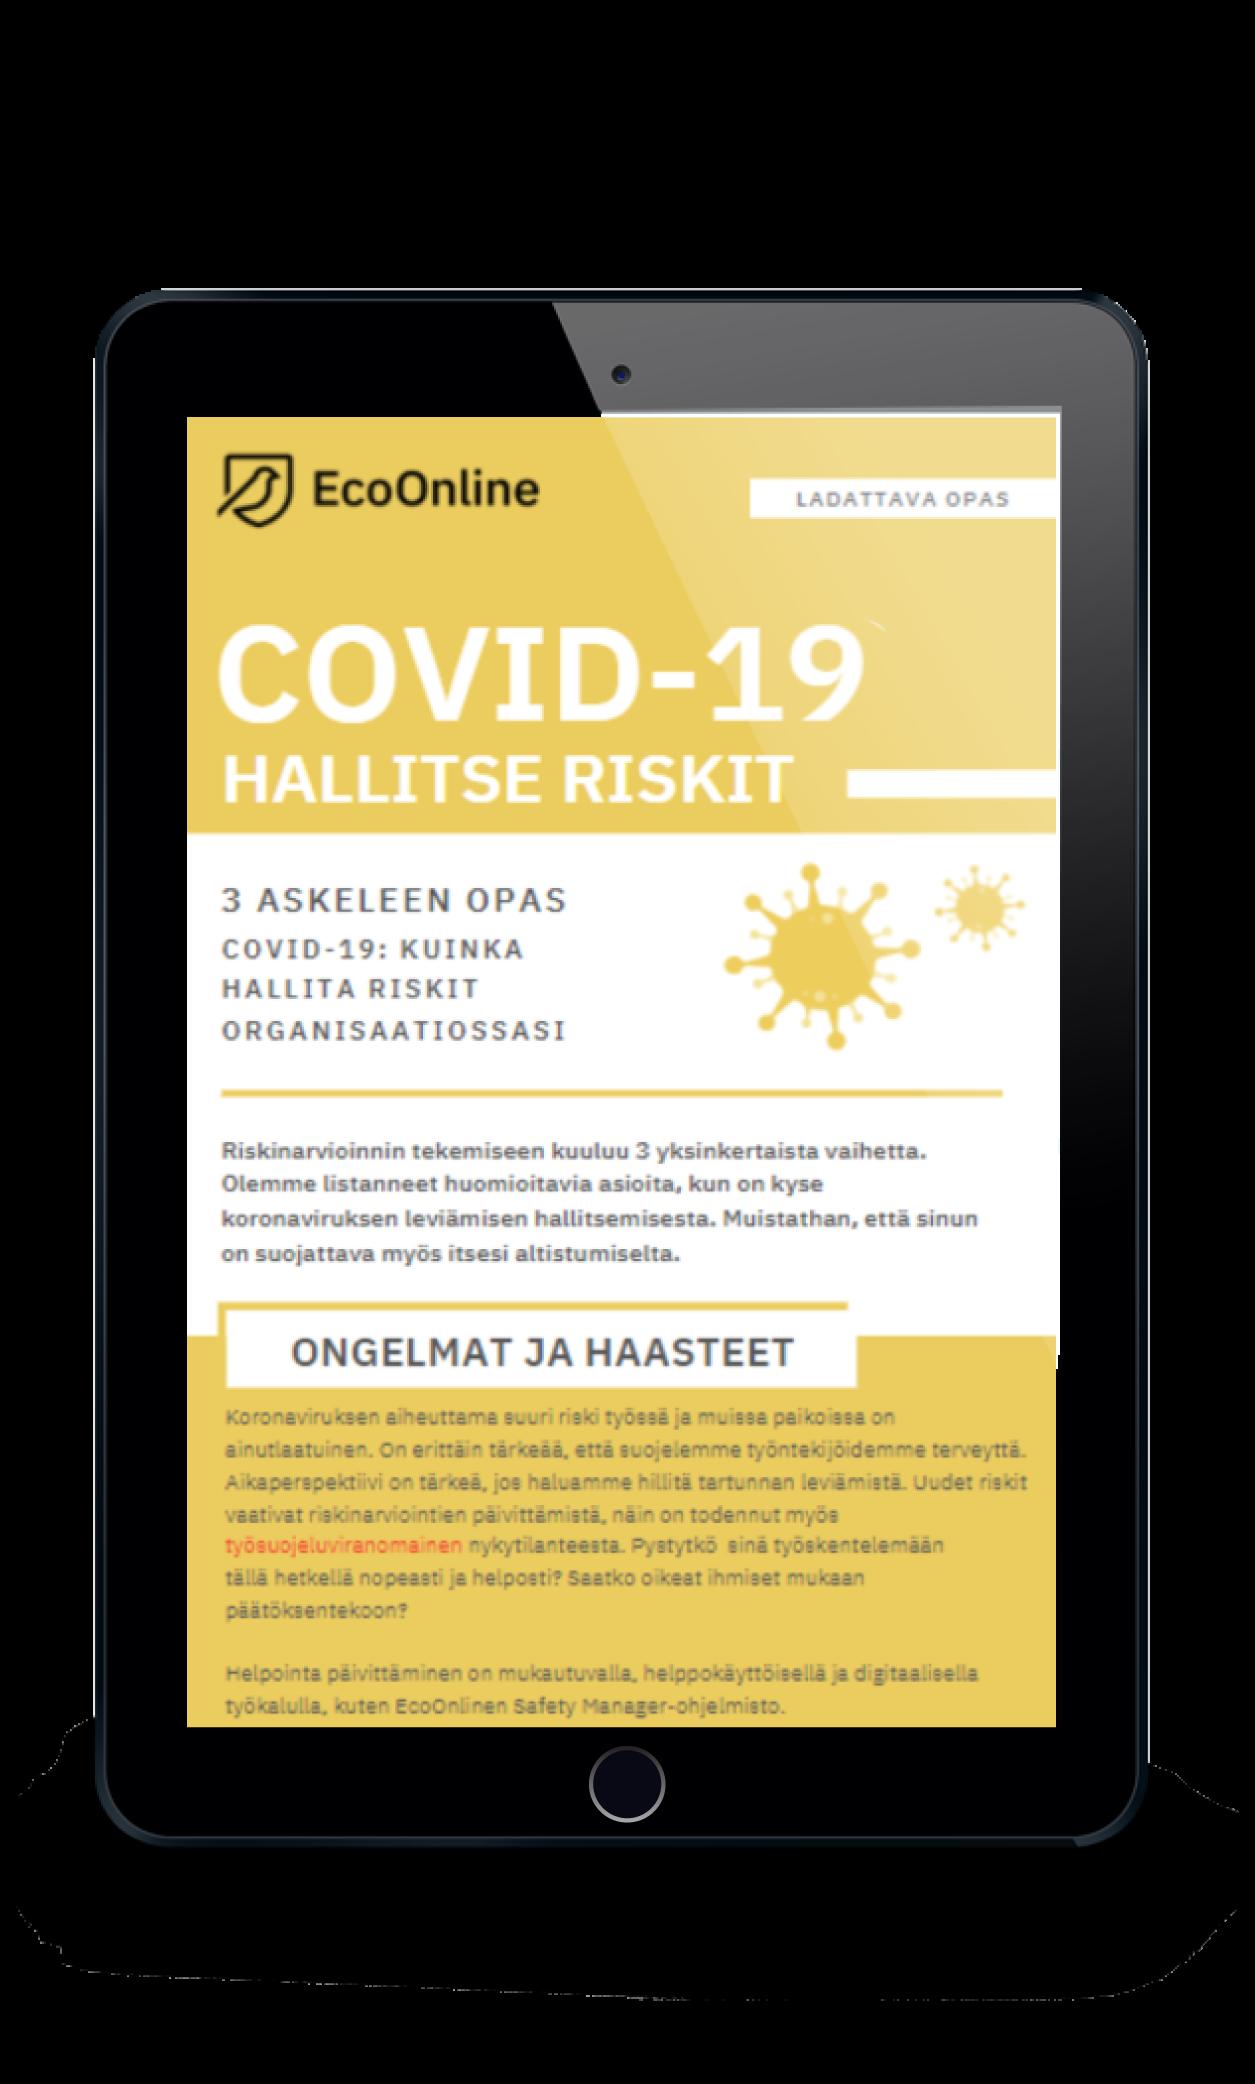 FI_Book Covers_covid